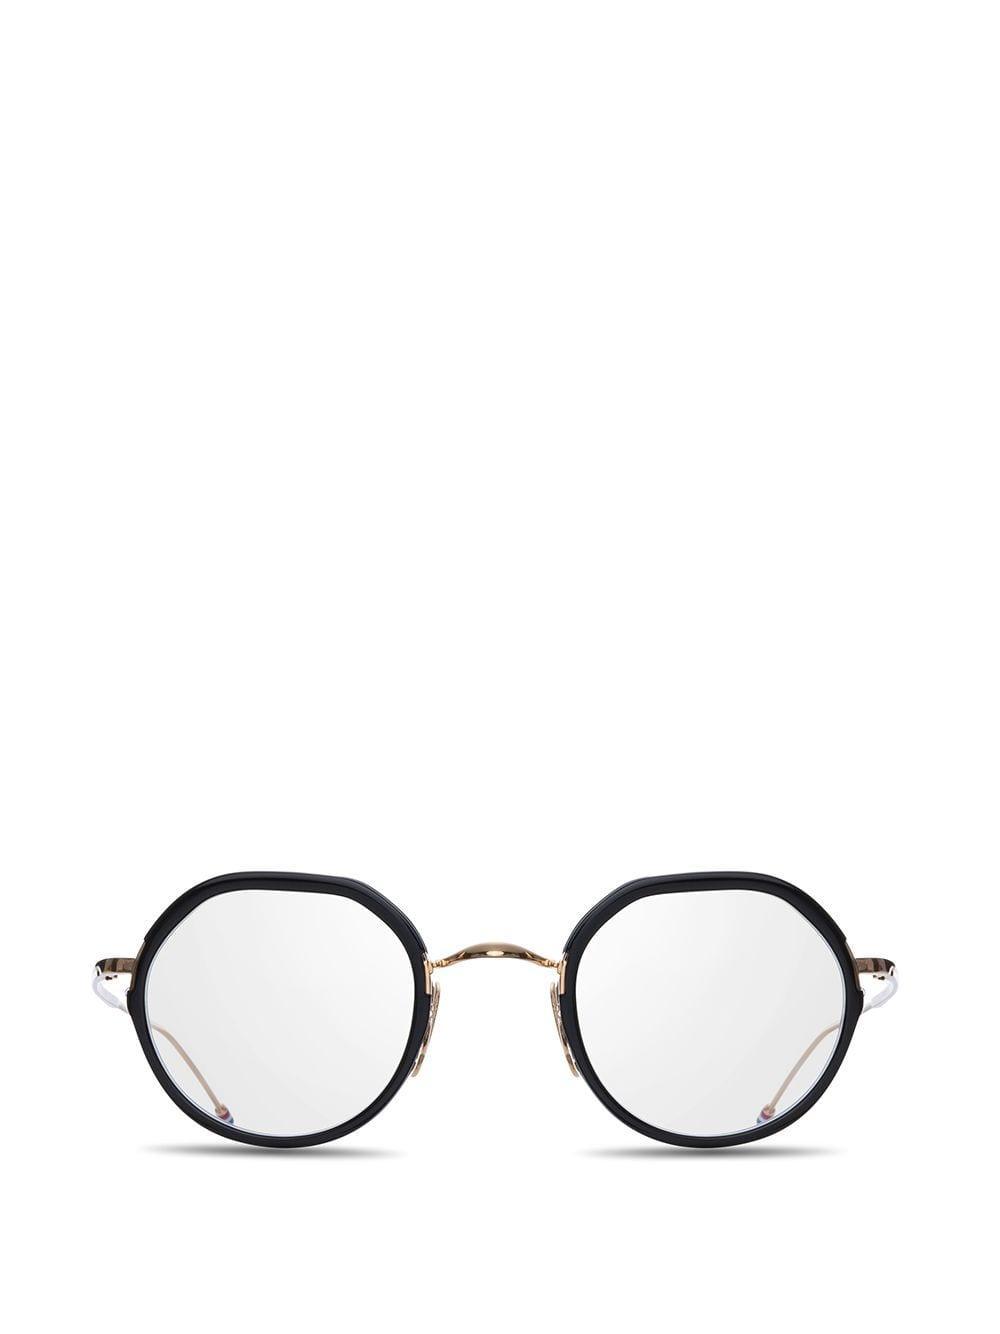 eb19a2256c Thom Browne - Black Oval Frame Glasses for Men - Lyst. View fullscreen